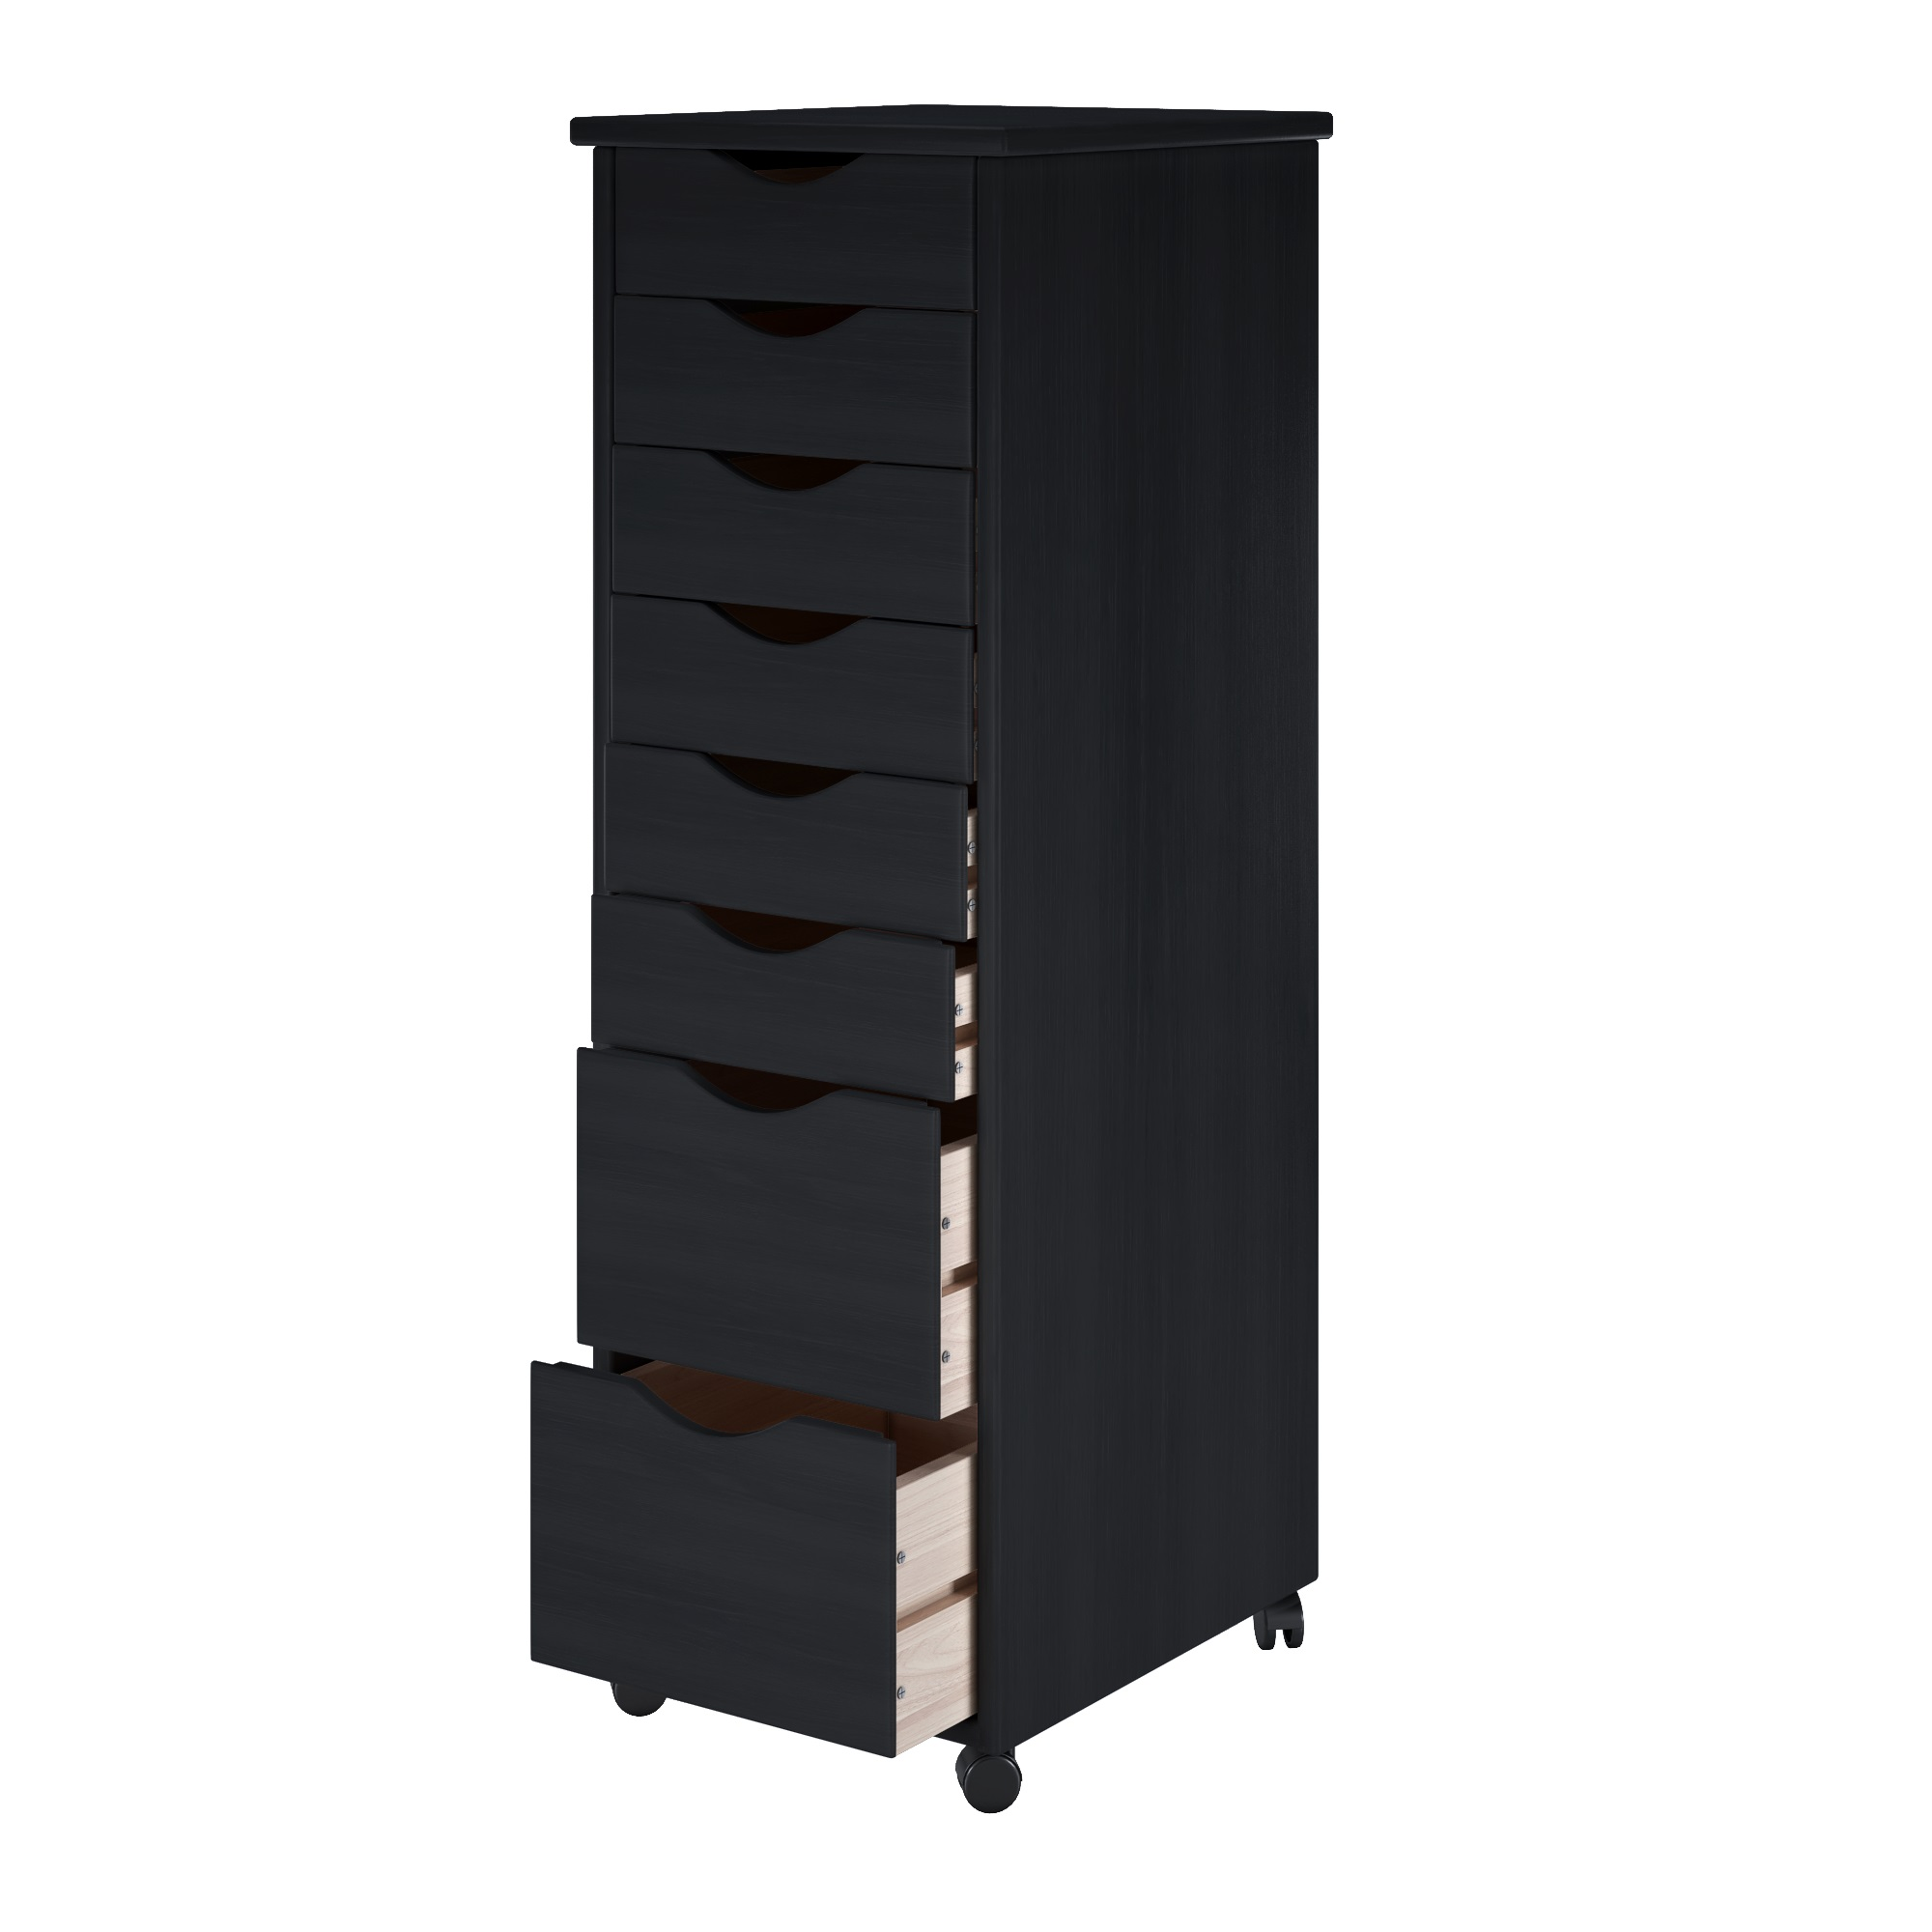 6 Plus 2 Drawer Solid Wood Roll Cart in Black - Adeptus 76171